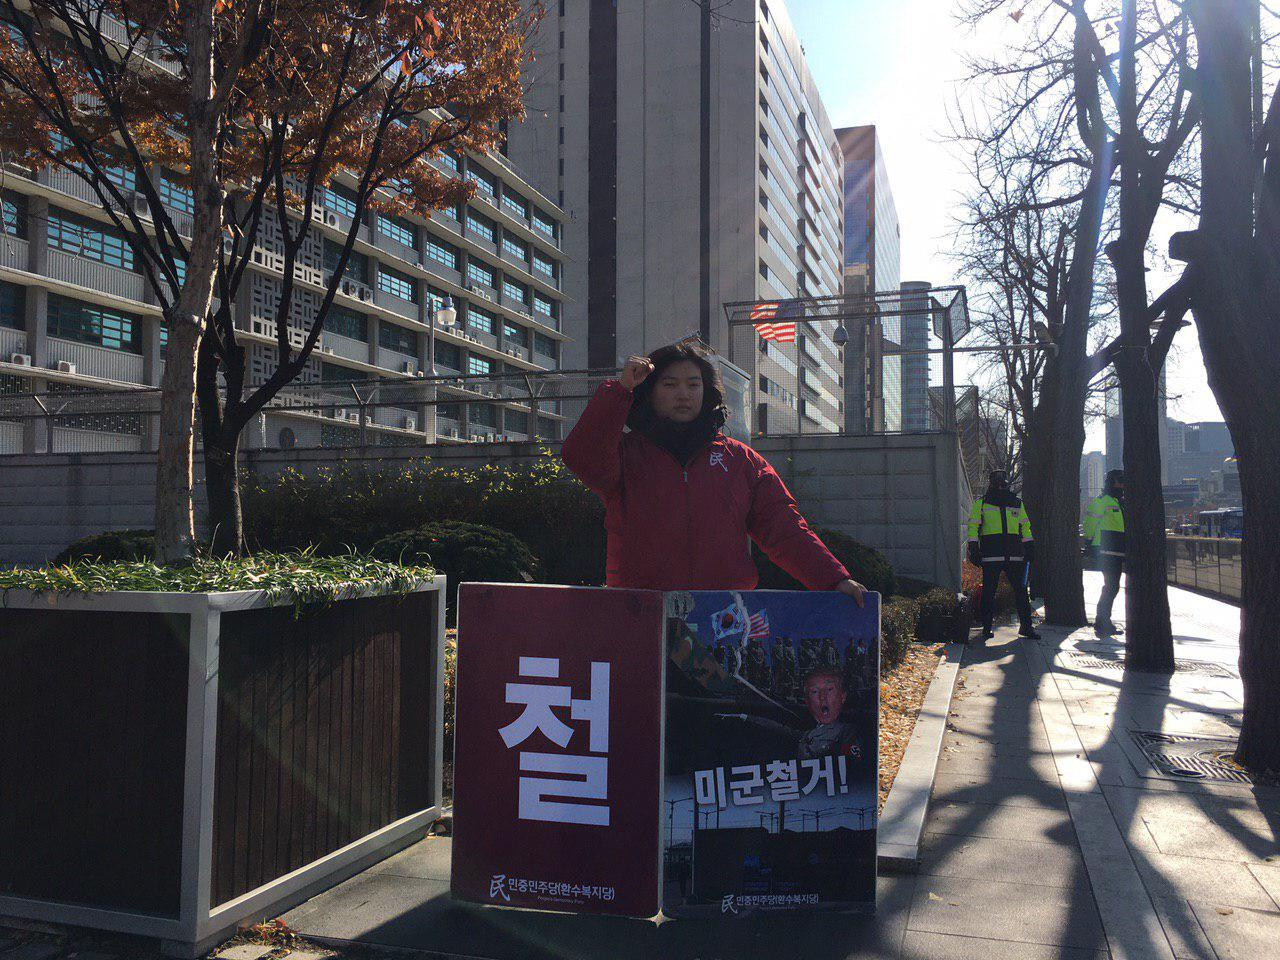 photo_2019-12-02_12-50-04.jpg